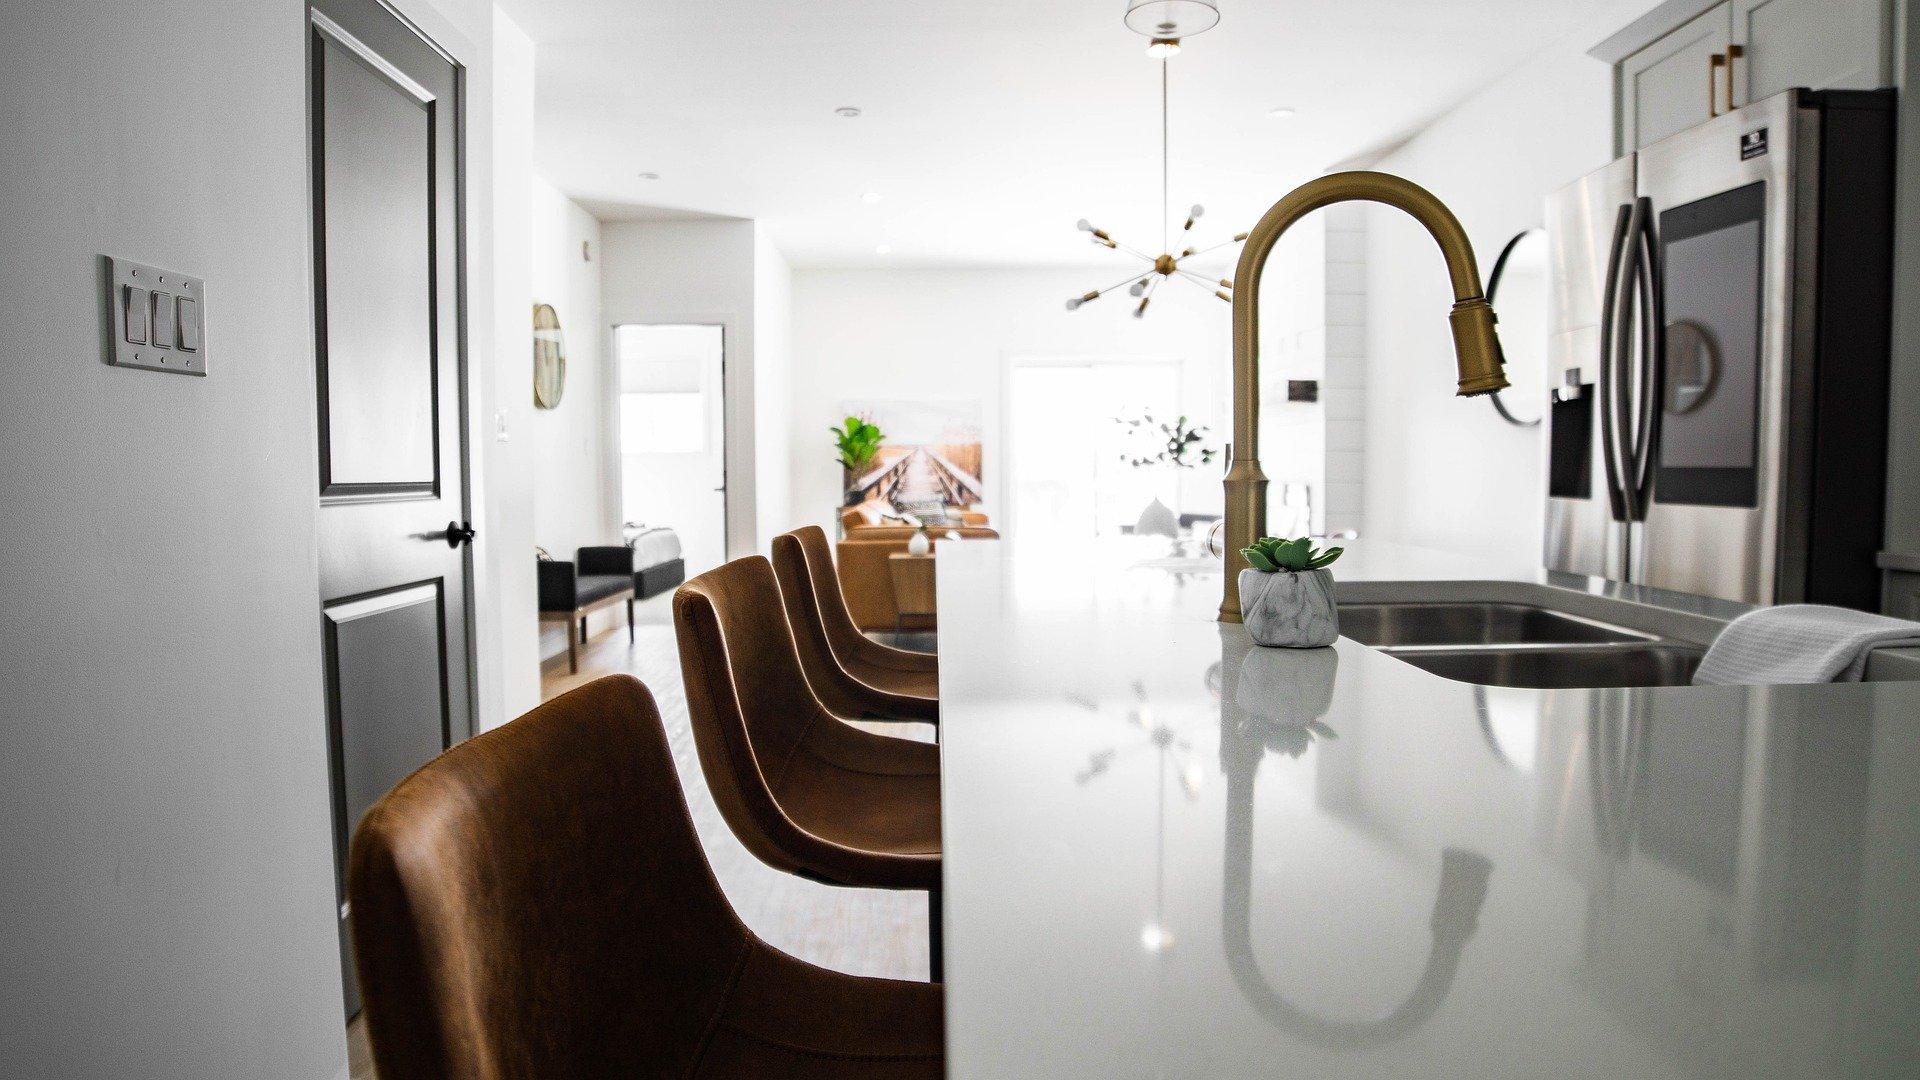 7-tips-for-managing-rental-property